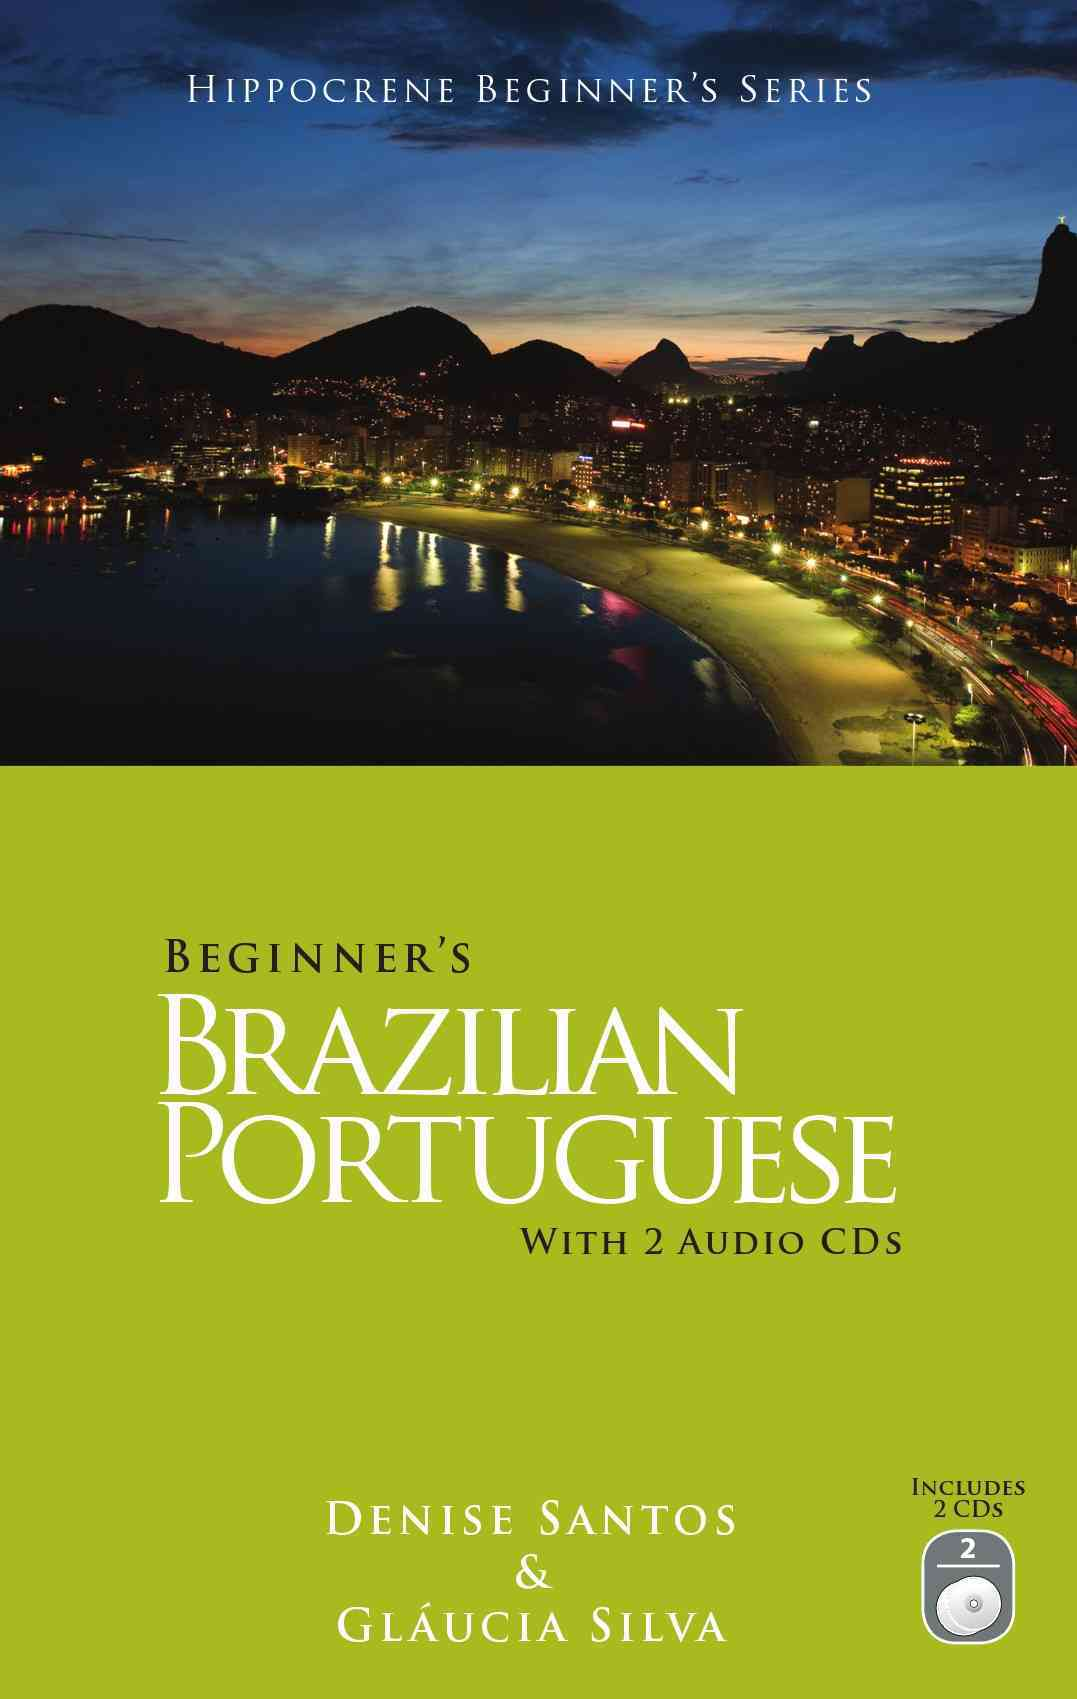 Beginner's Brazilian Portuguese